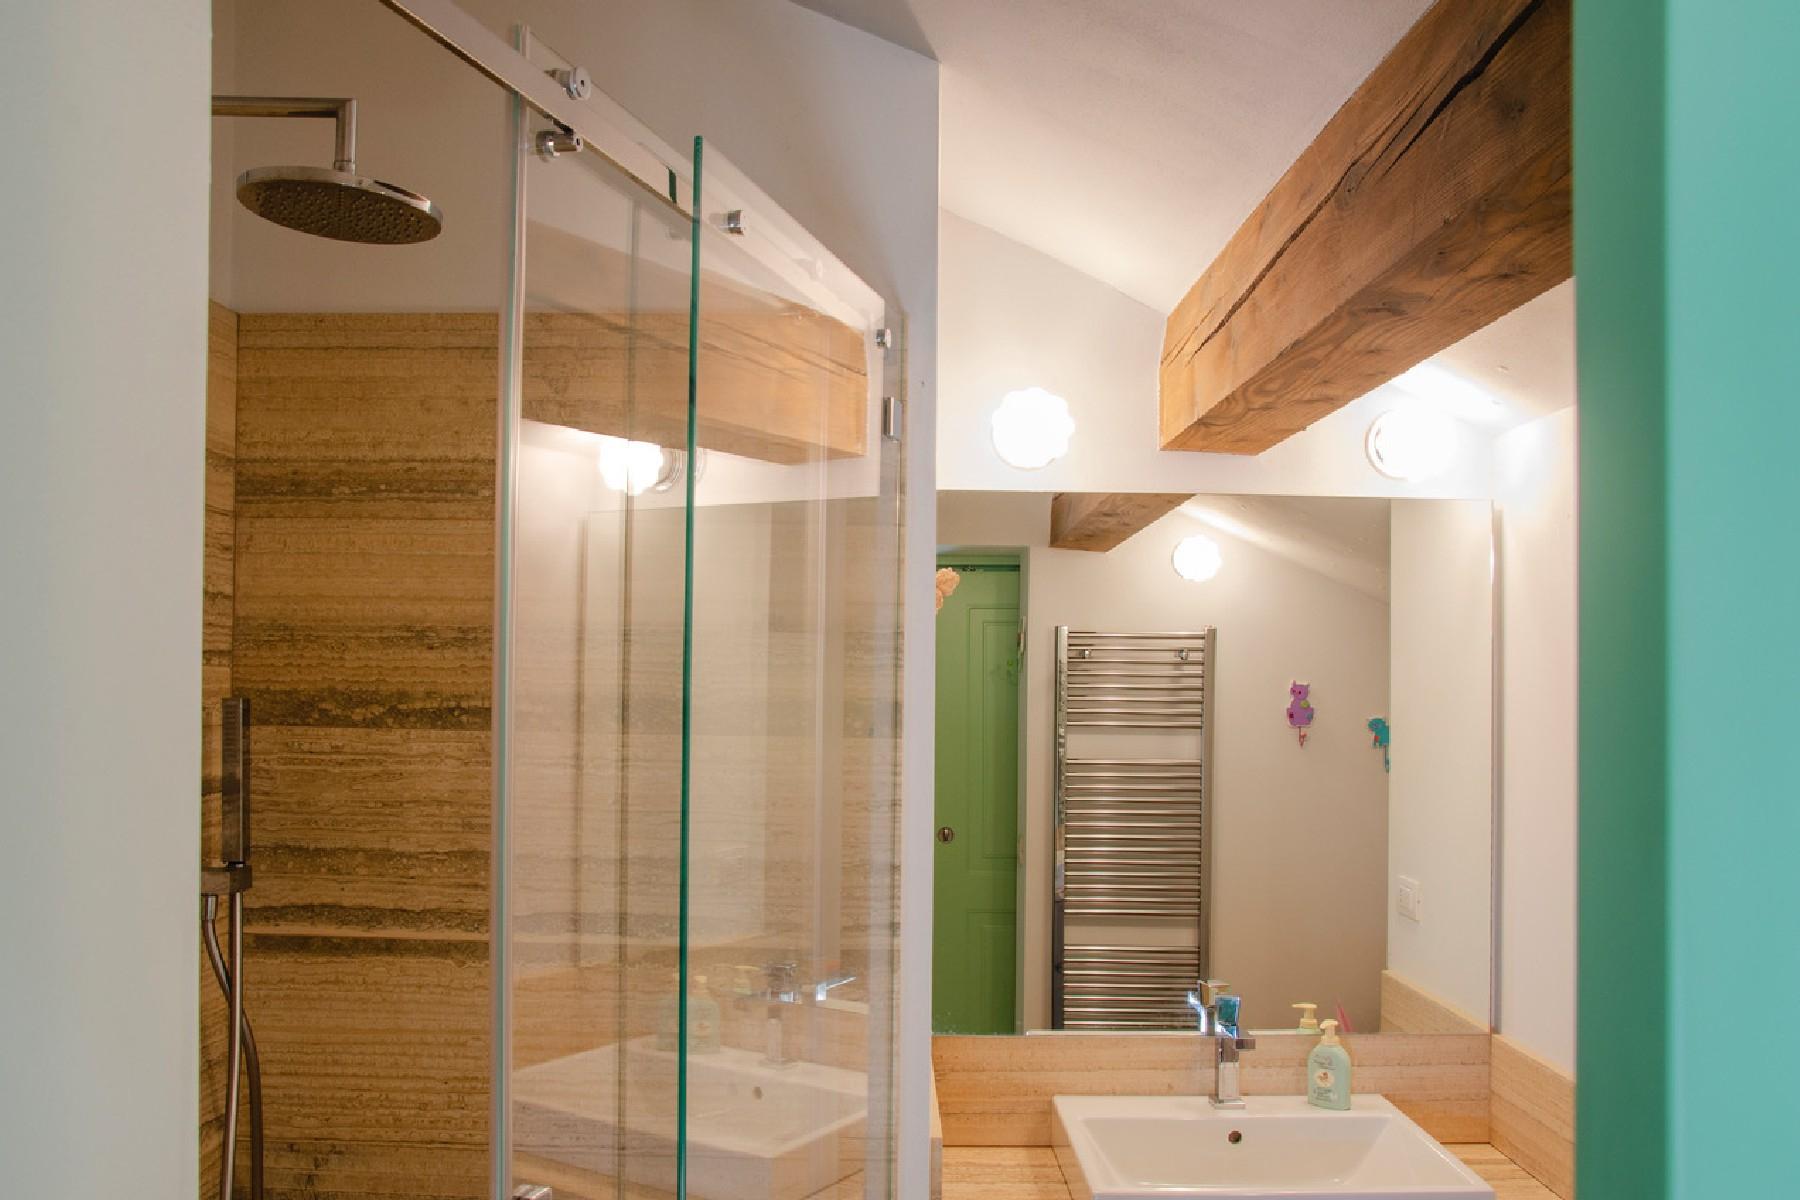 Appartamento in Vendita a Merate: 4 locali, 225 mq - Foto 22